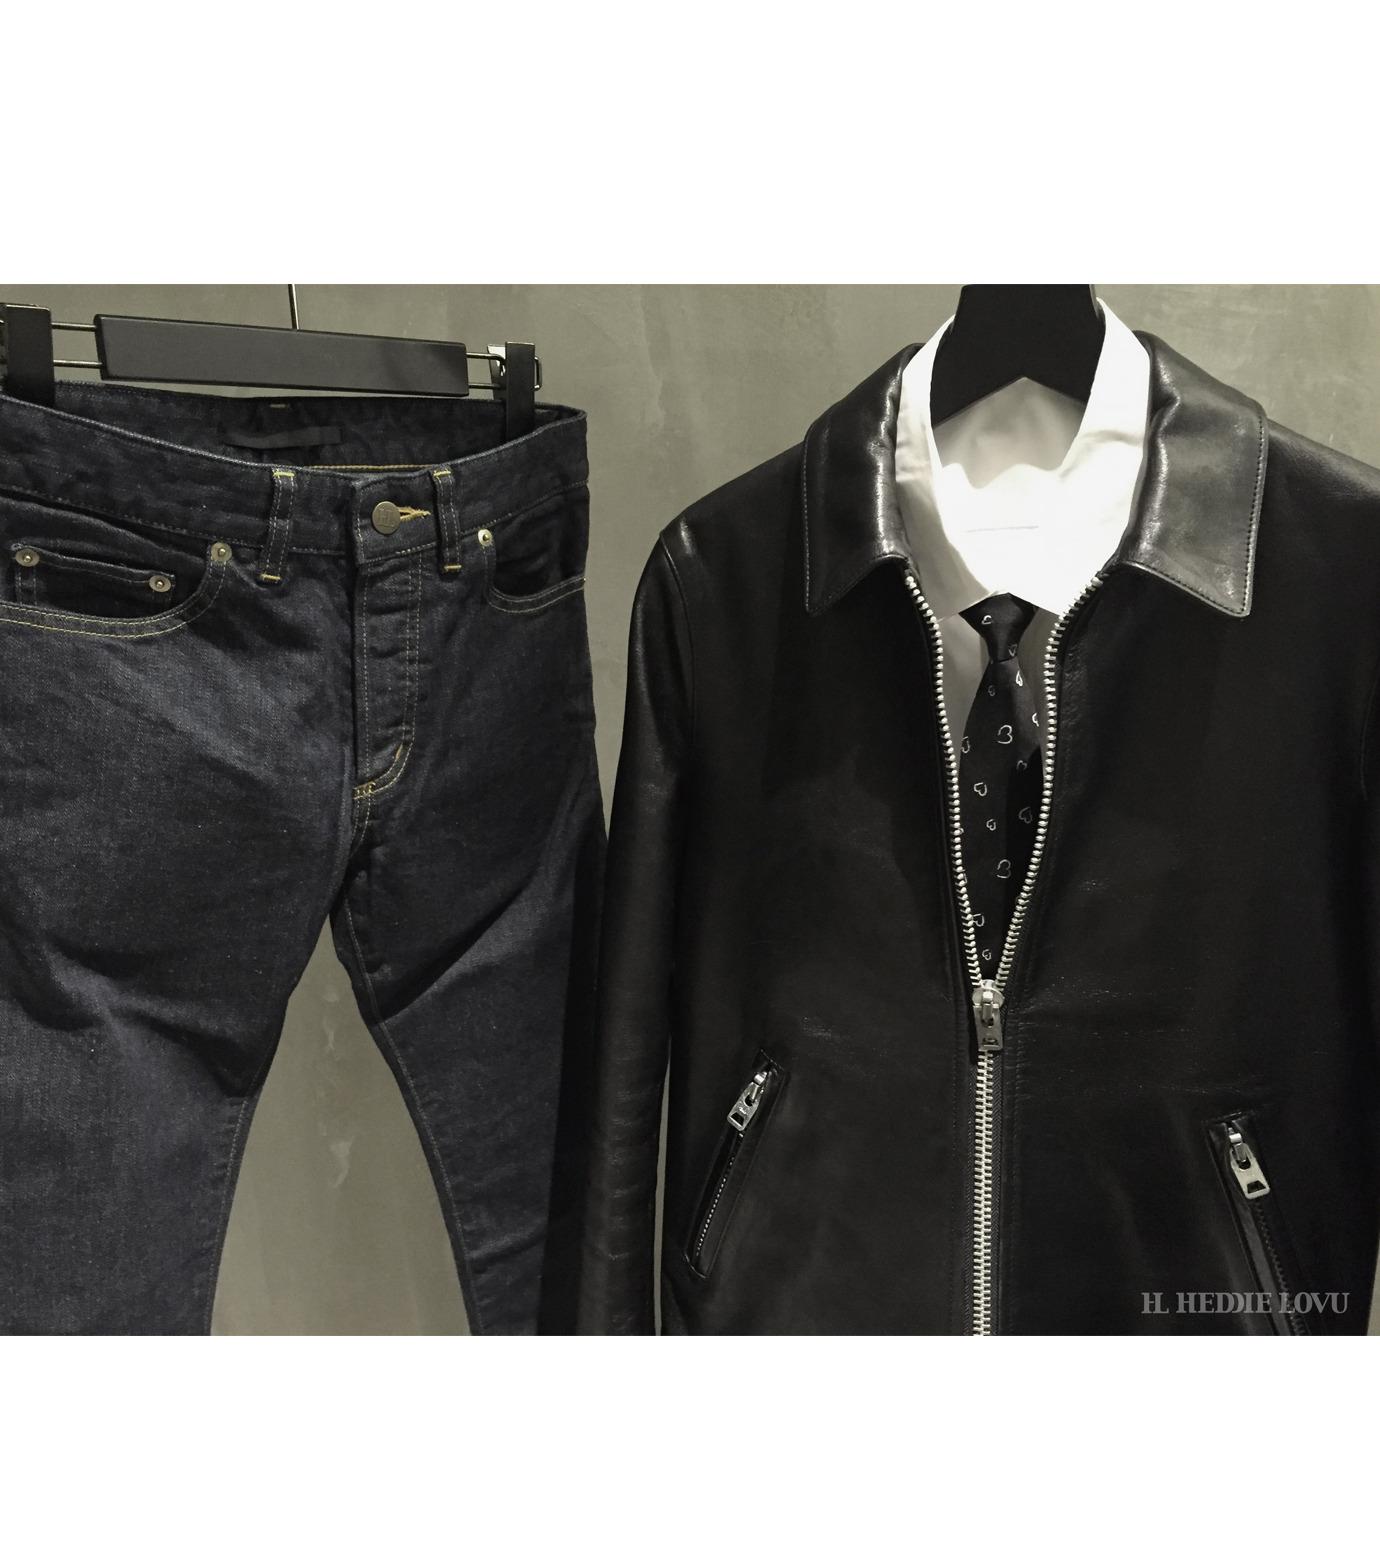 HL HEDDIE LOVU(エイチエル・エディールーヴ)のHL Riders S JK-BLACK(ジャケット/jacket)-17S94002-13 拡大詳細画像7